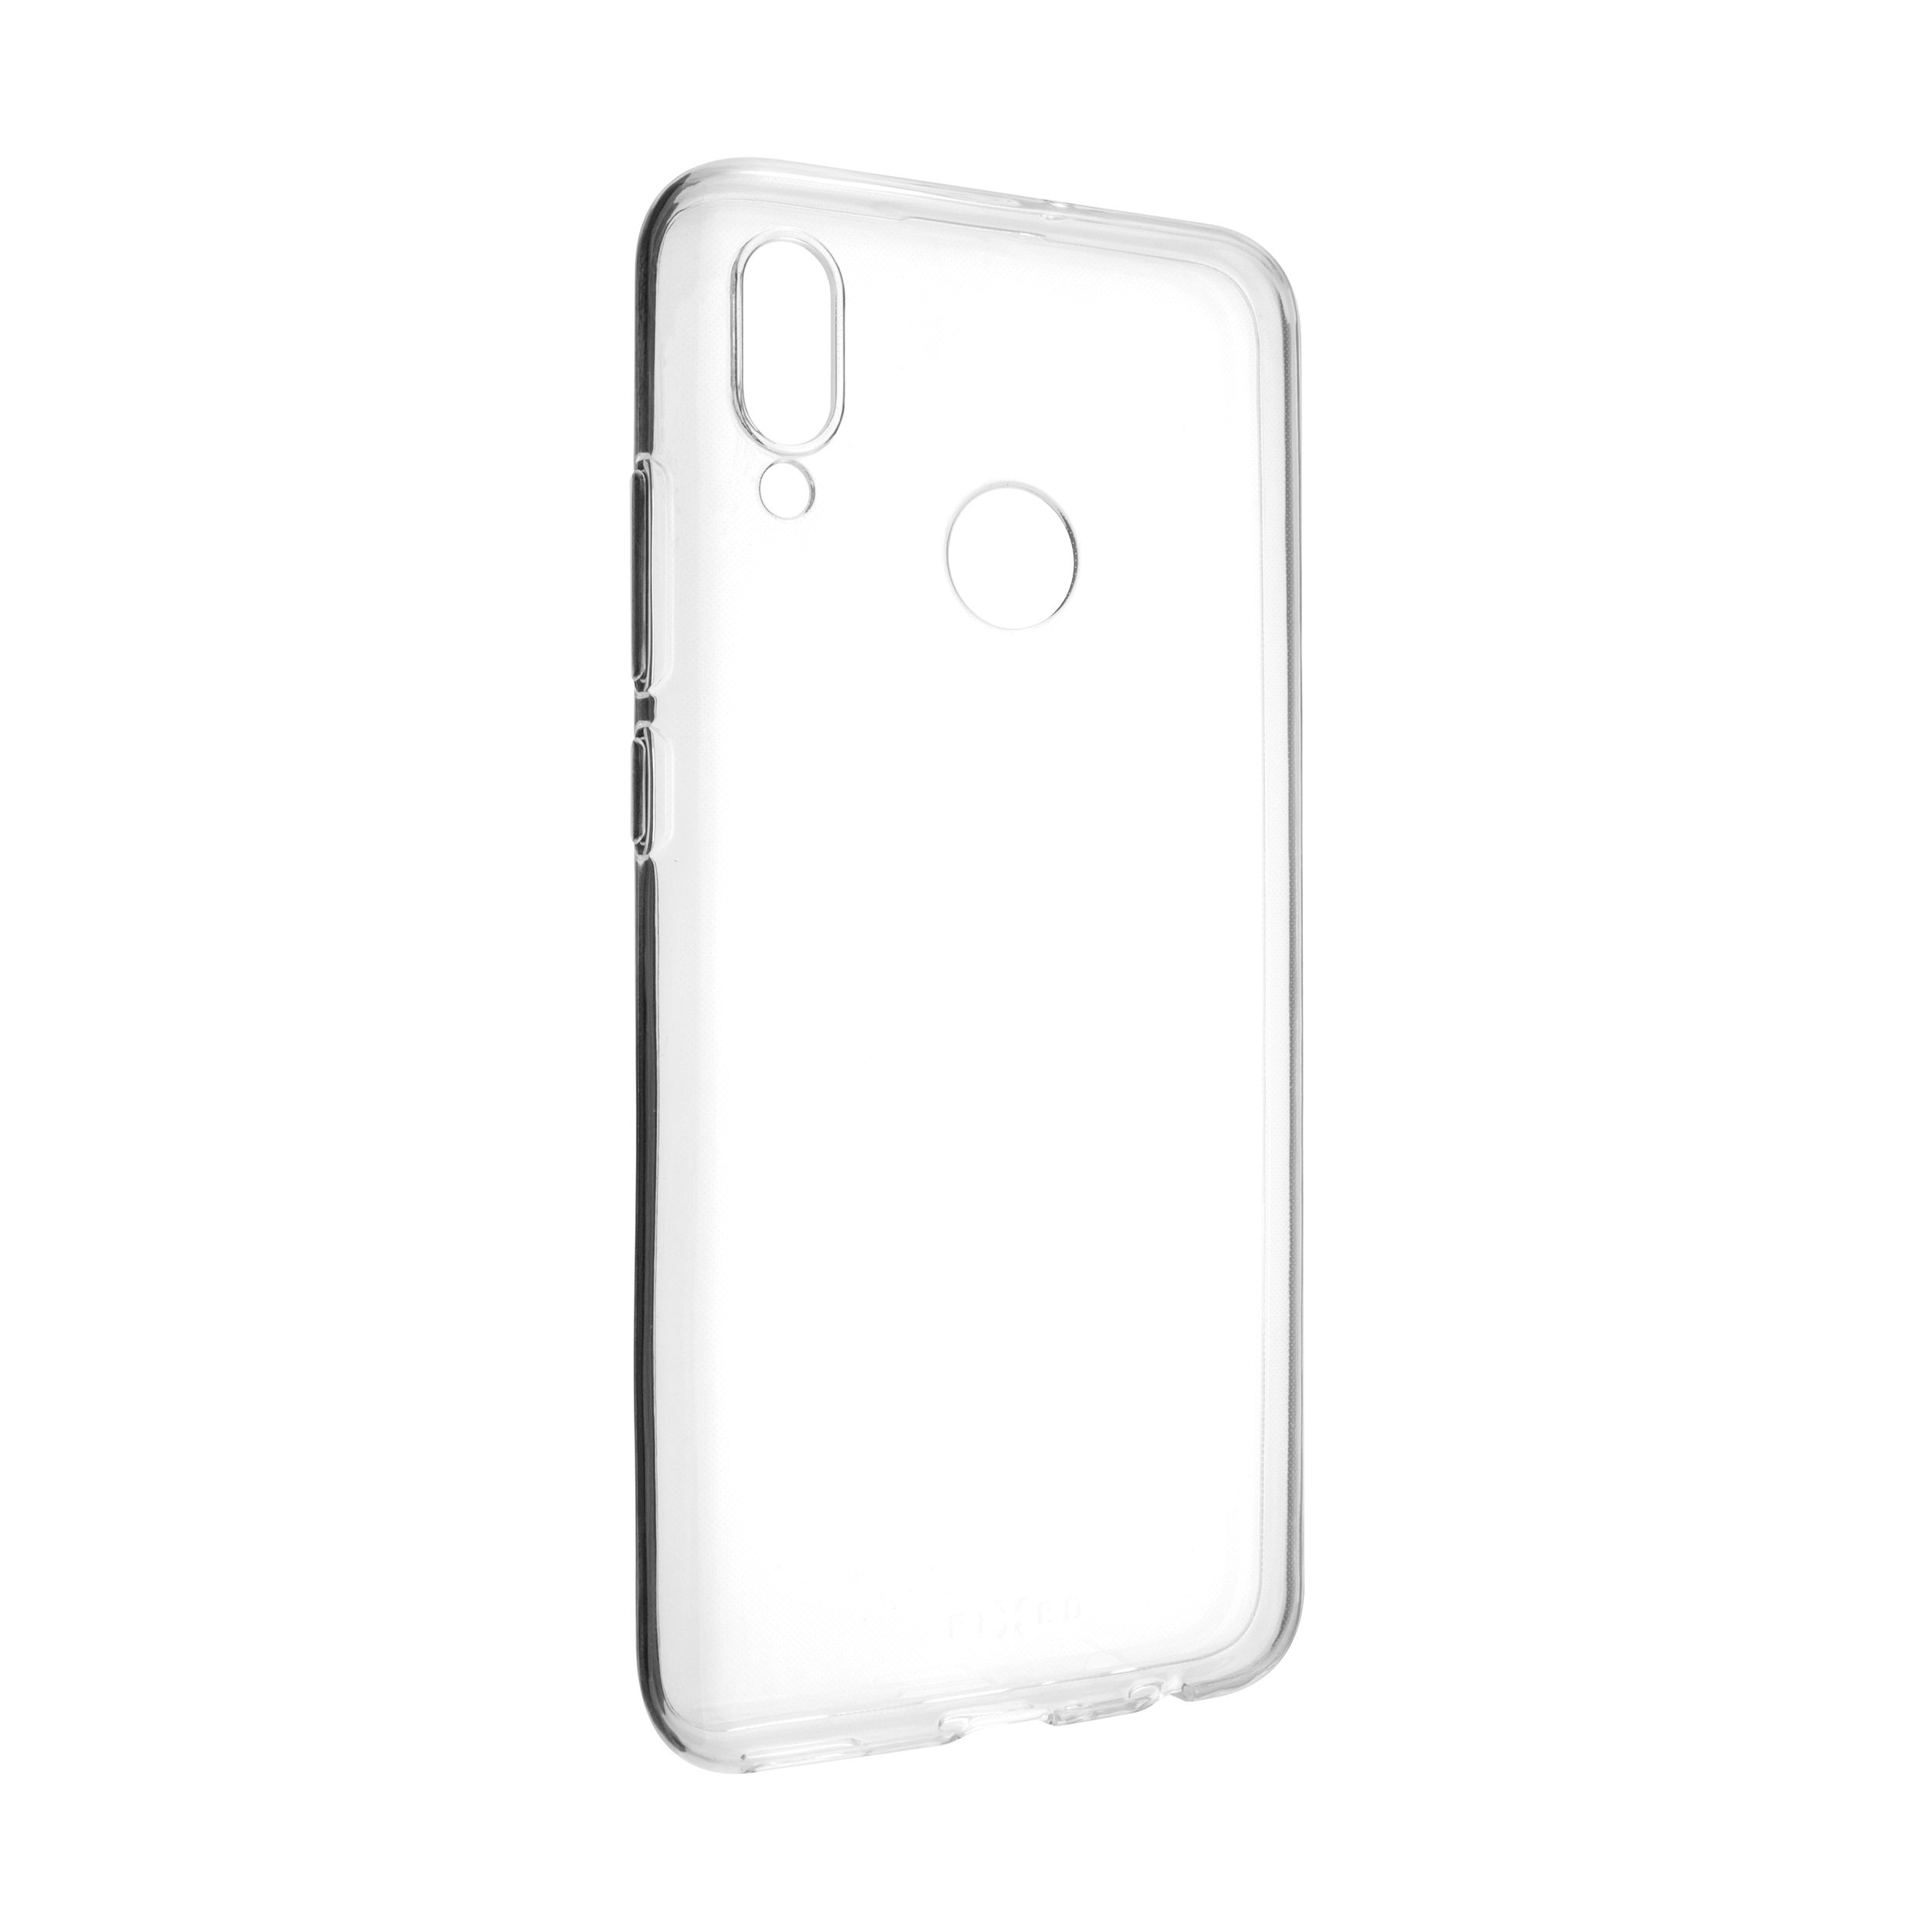 TPU gelové pouzdro FIXED pro Huawei P Smart (2019), čiré